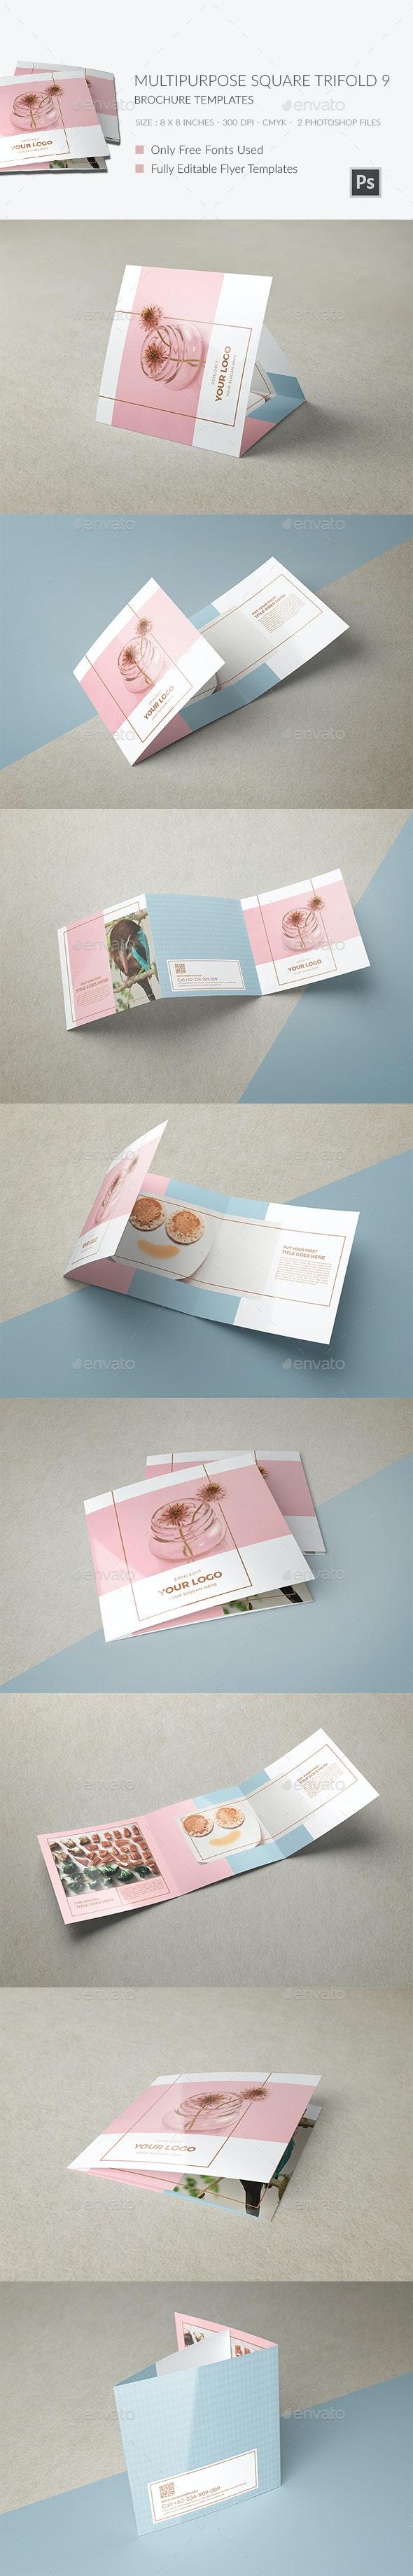 Multipurpose Square Trifold Brochure - Brochures Print Templates